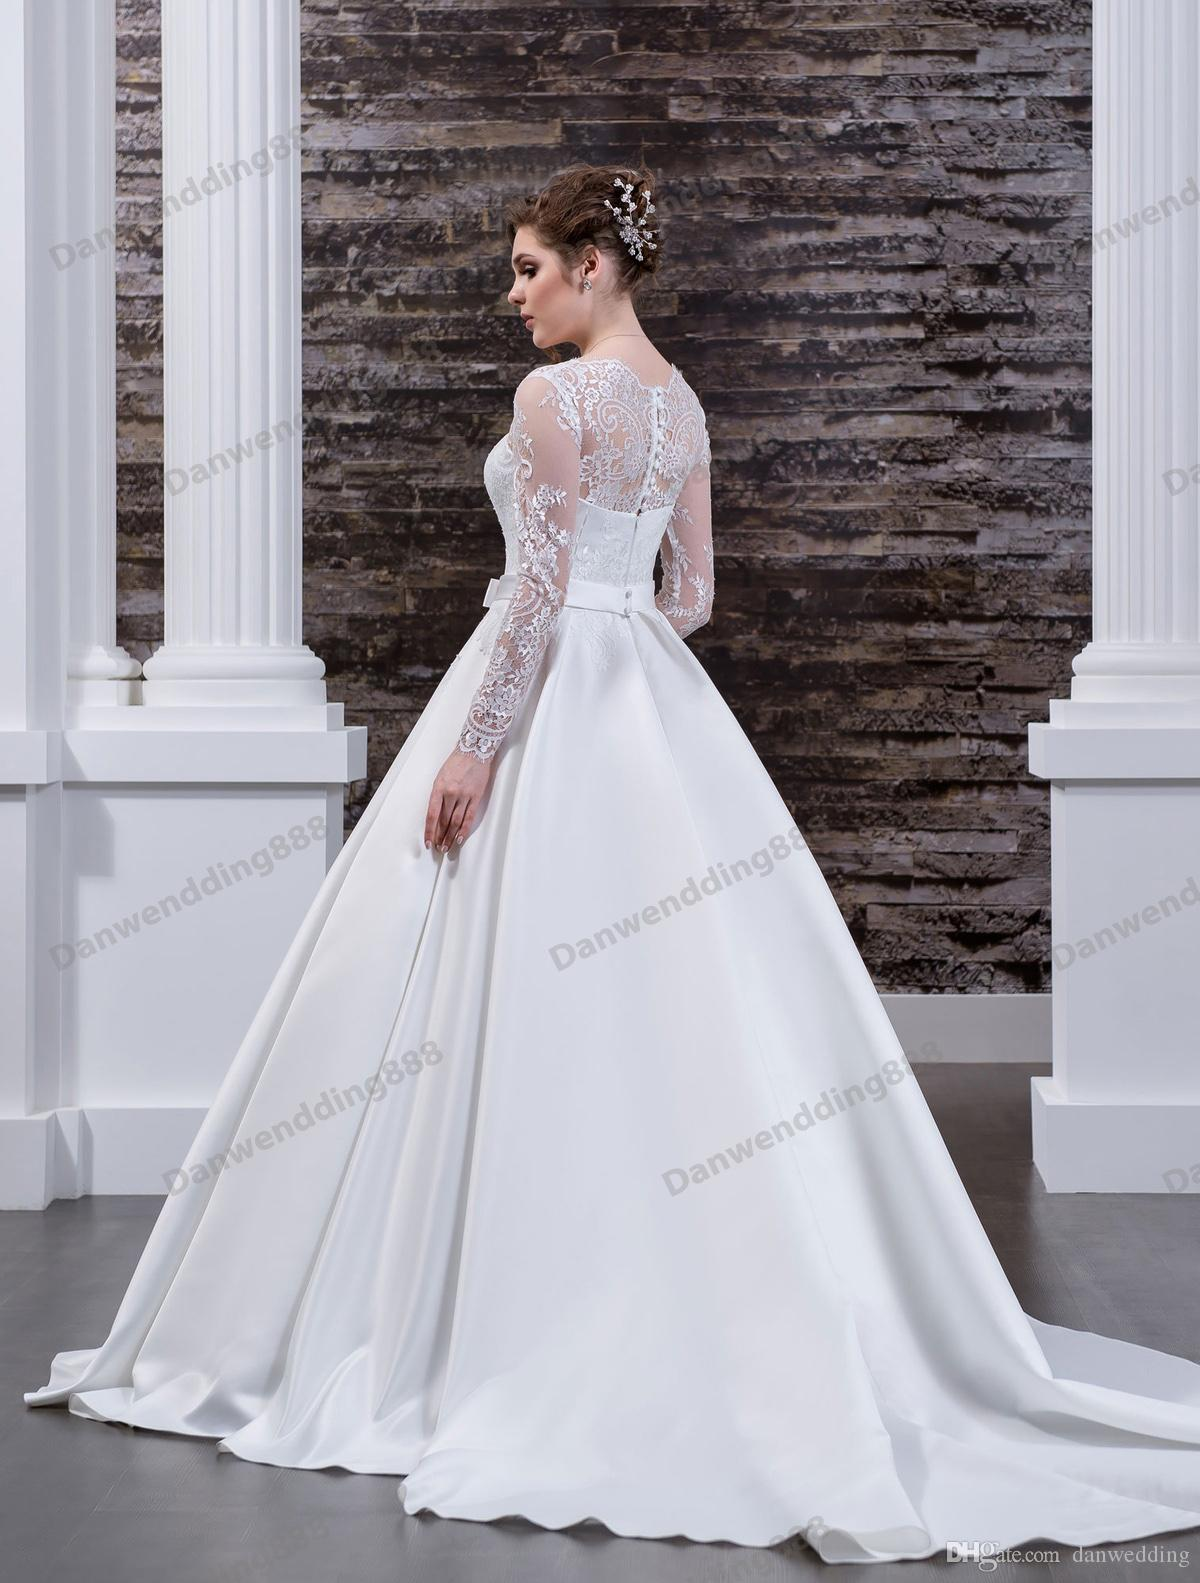 Elegant White Lace/Satin Scoop Long Sleeves A-Line Wedding Dresses Bridal Pageant Dresses Wedding Attire Dresses Custom Size 2-16 ZW608062